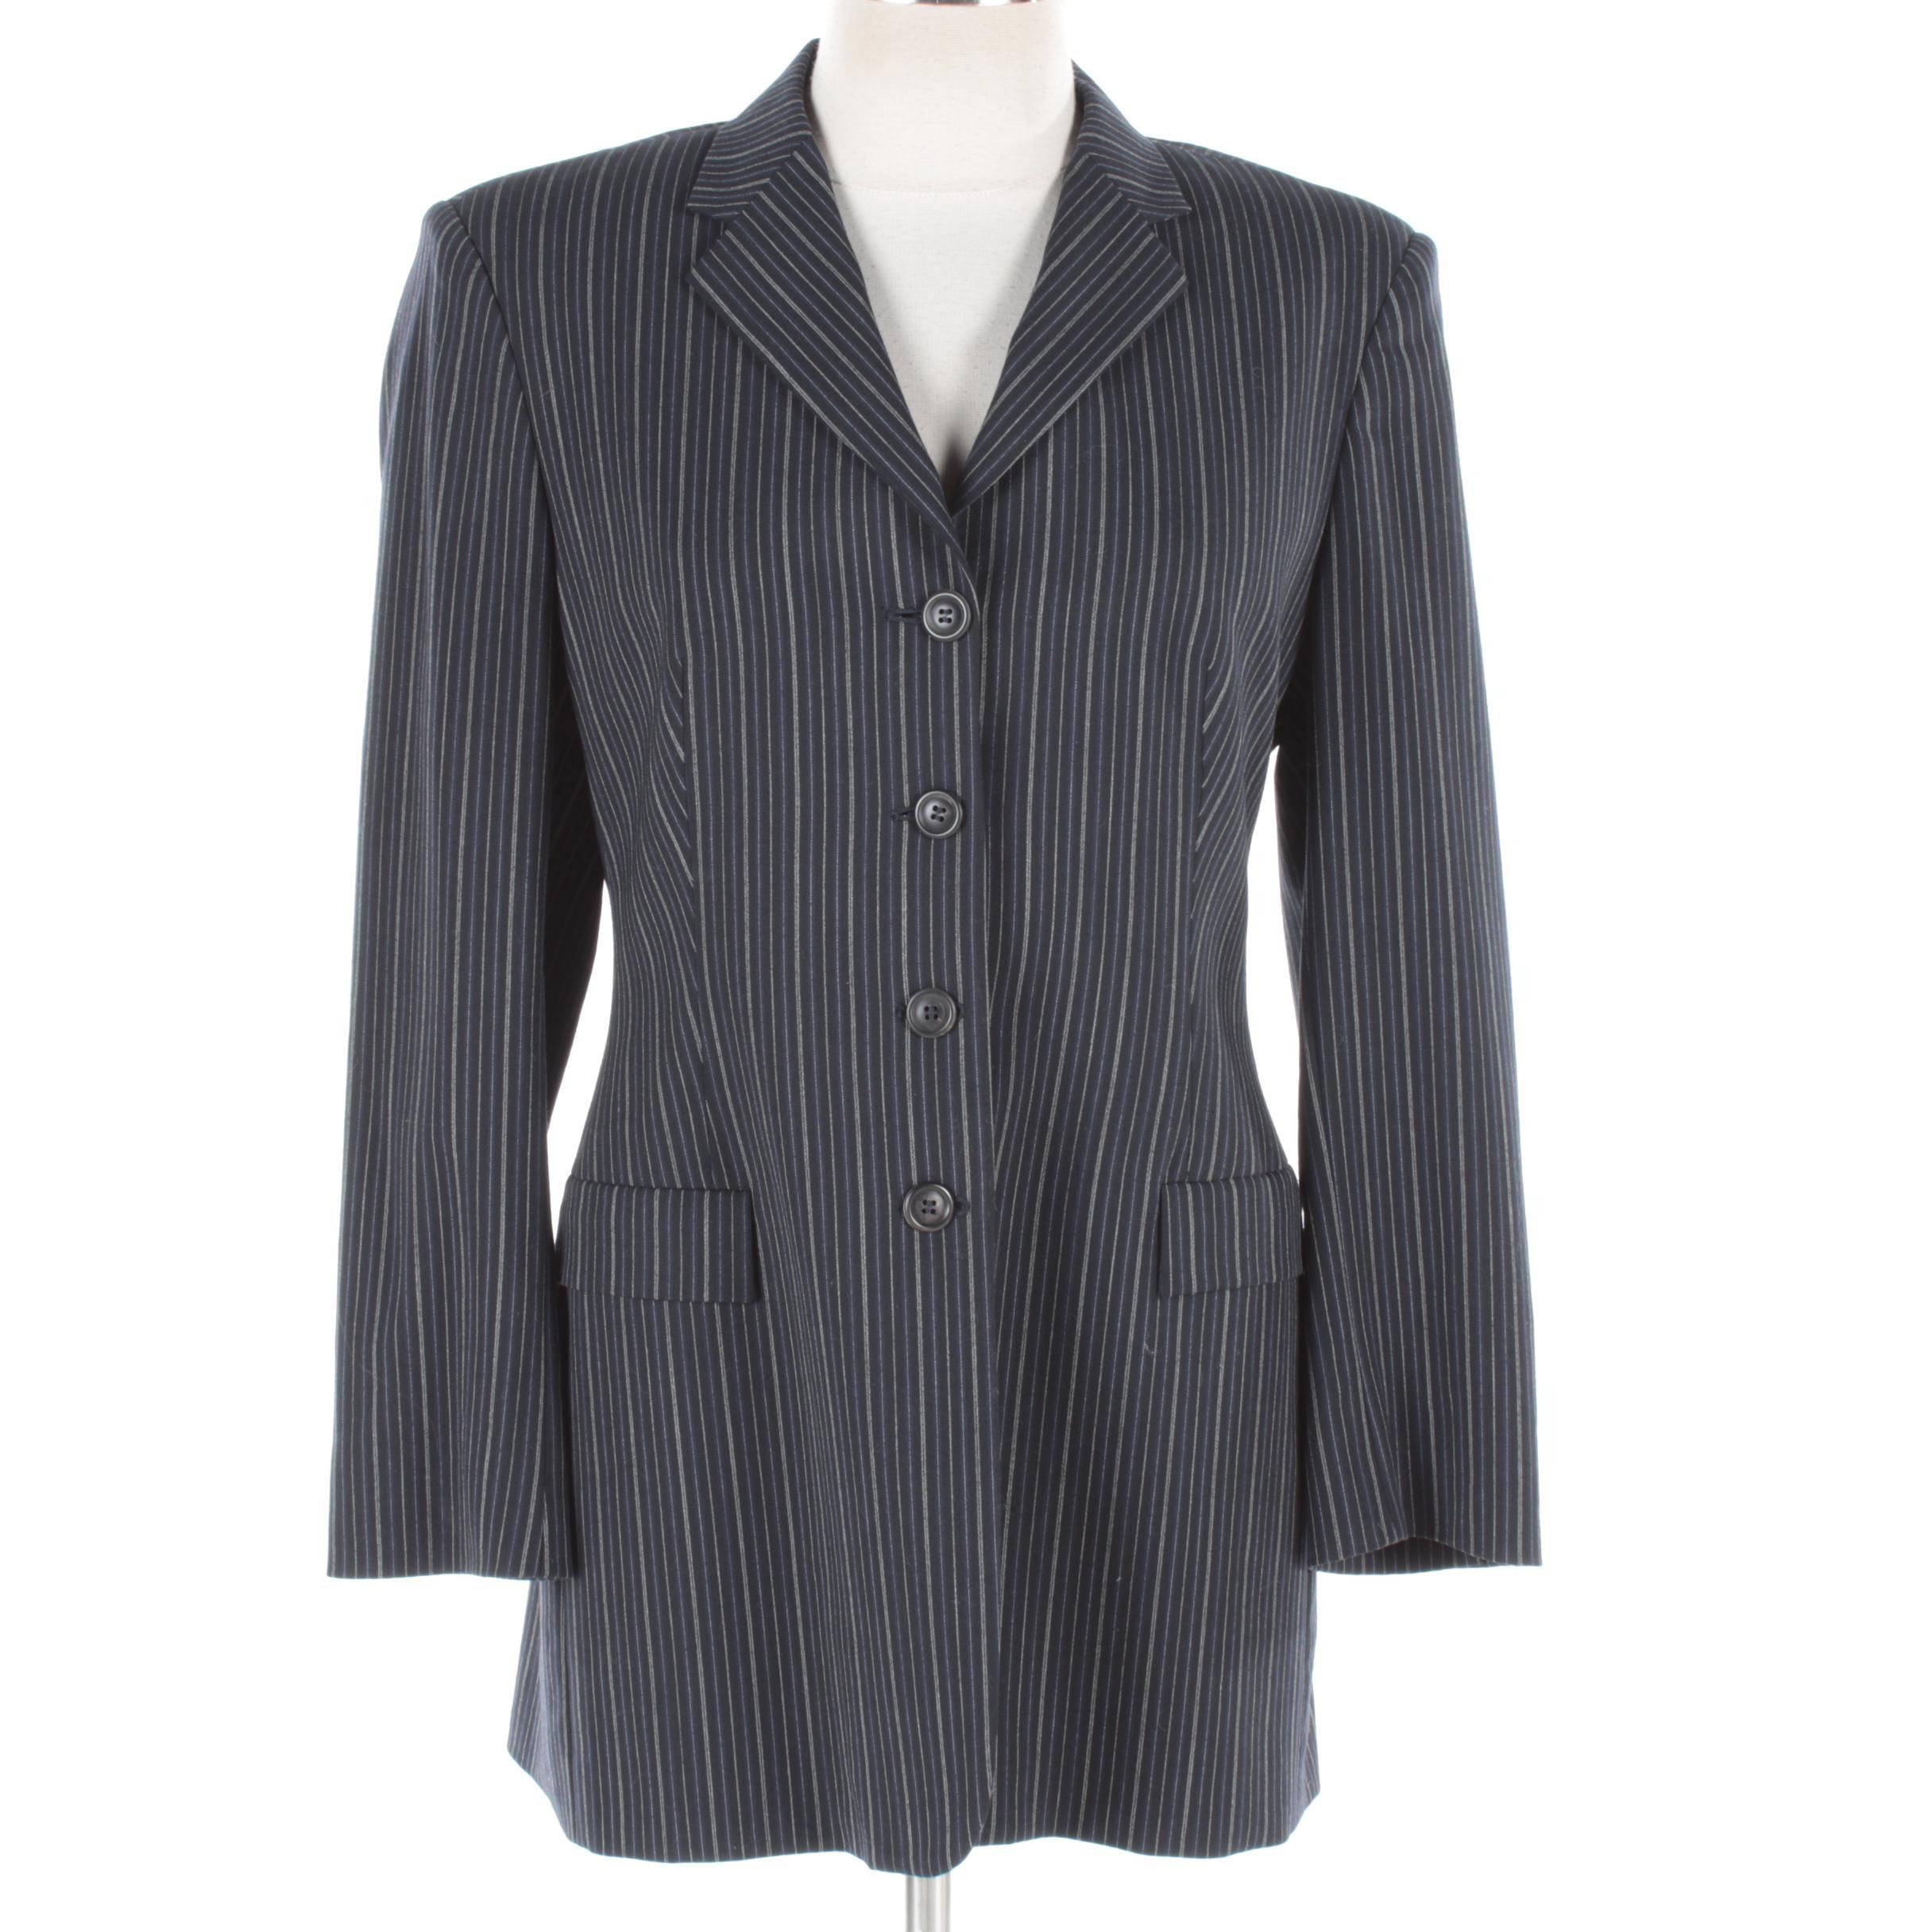 Women's Piazza Sempione Single-Breasted Navy Blue Striped Blazer